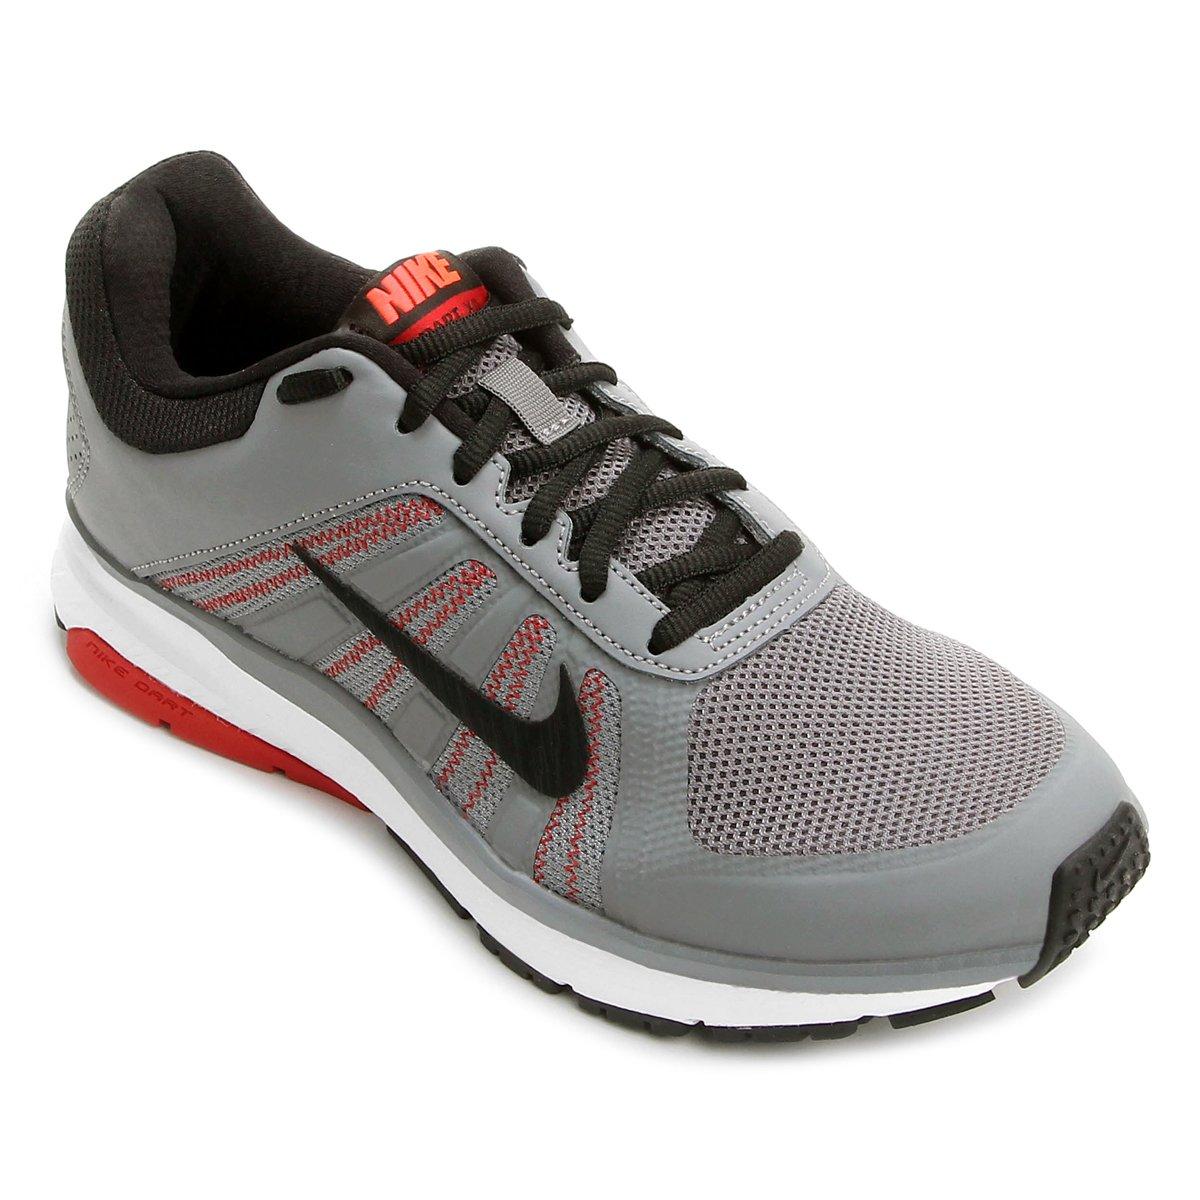 ec03c60e339 Tênis Nike Dart 12 MSL Masculino - Cinza e Preto - Compre Agora ...